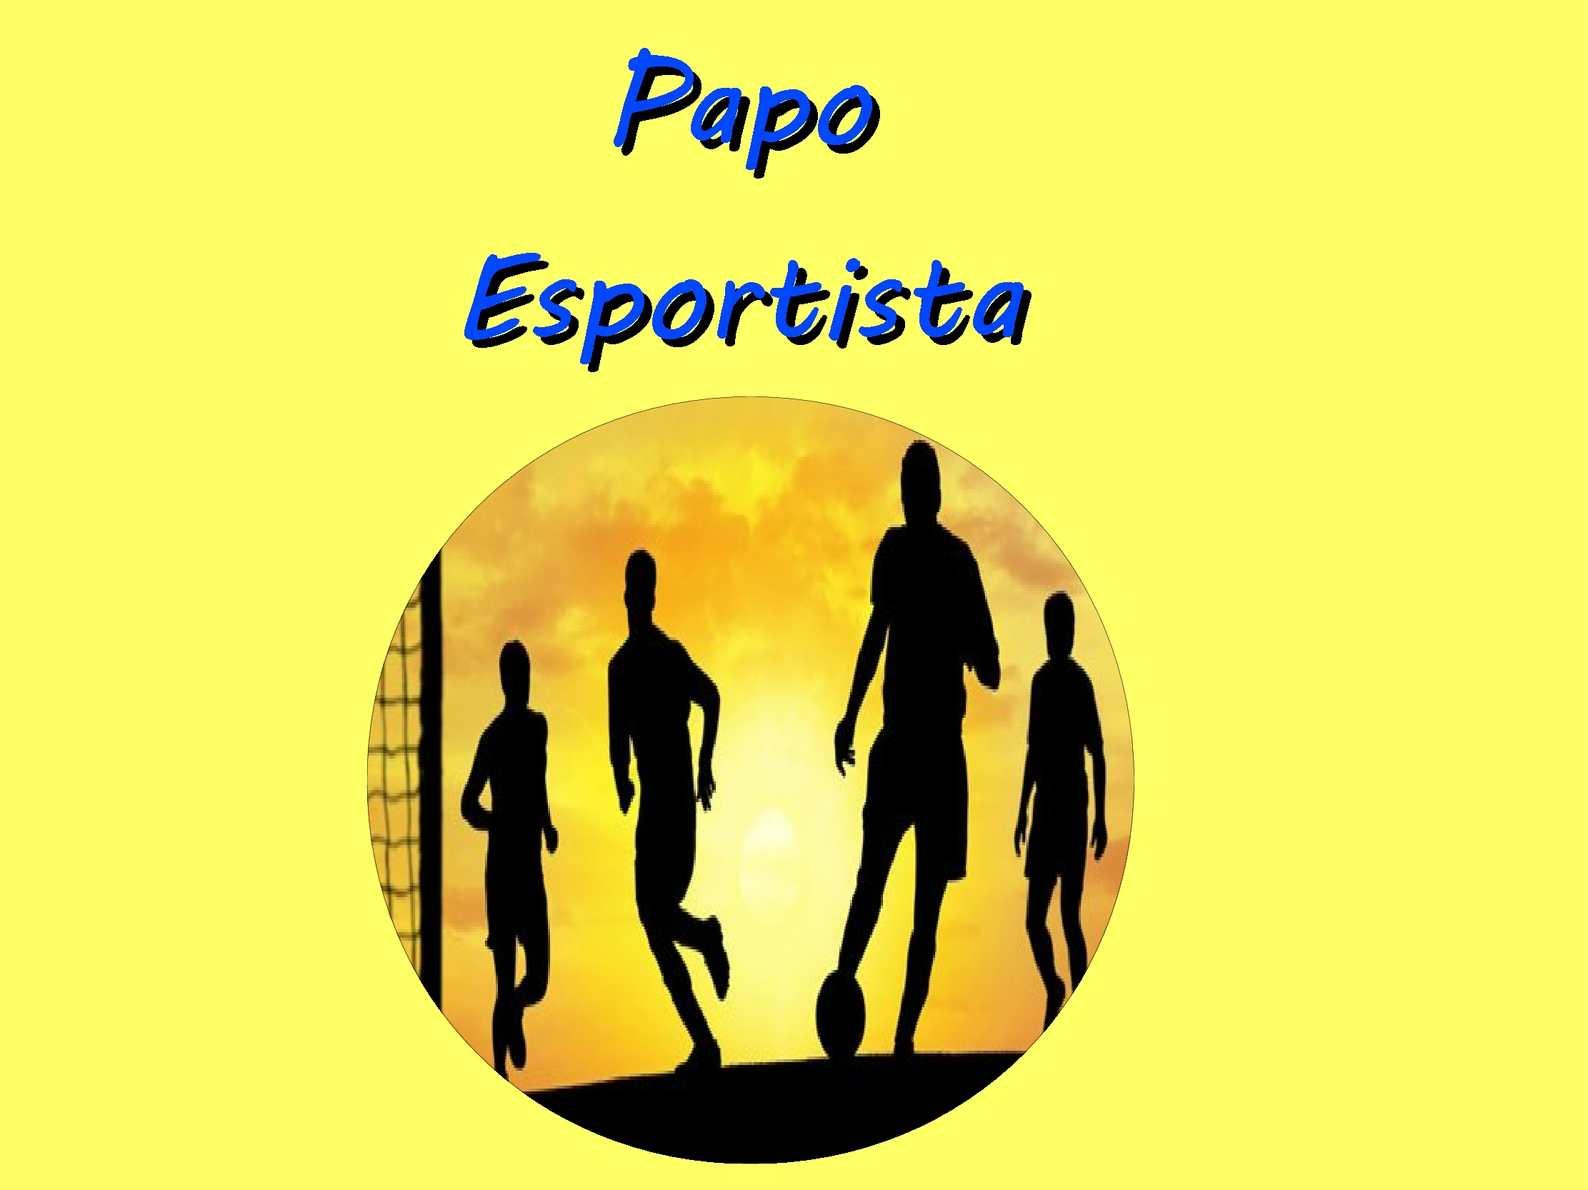 856dd8257 Calaméo - FanZine - Papo Esportista